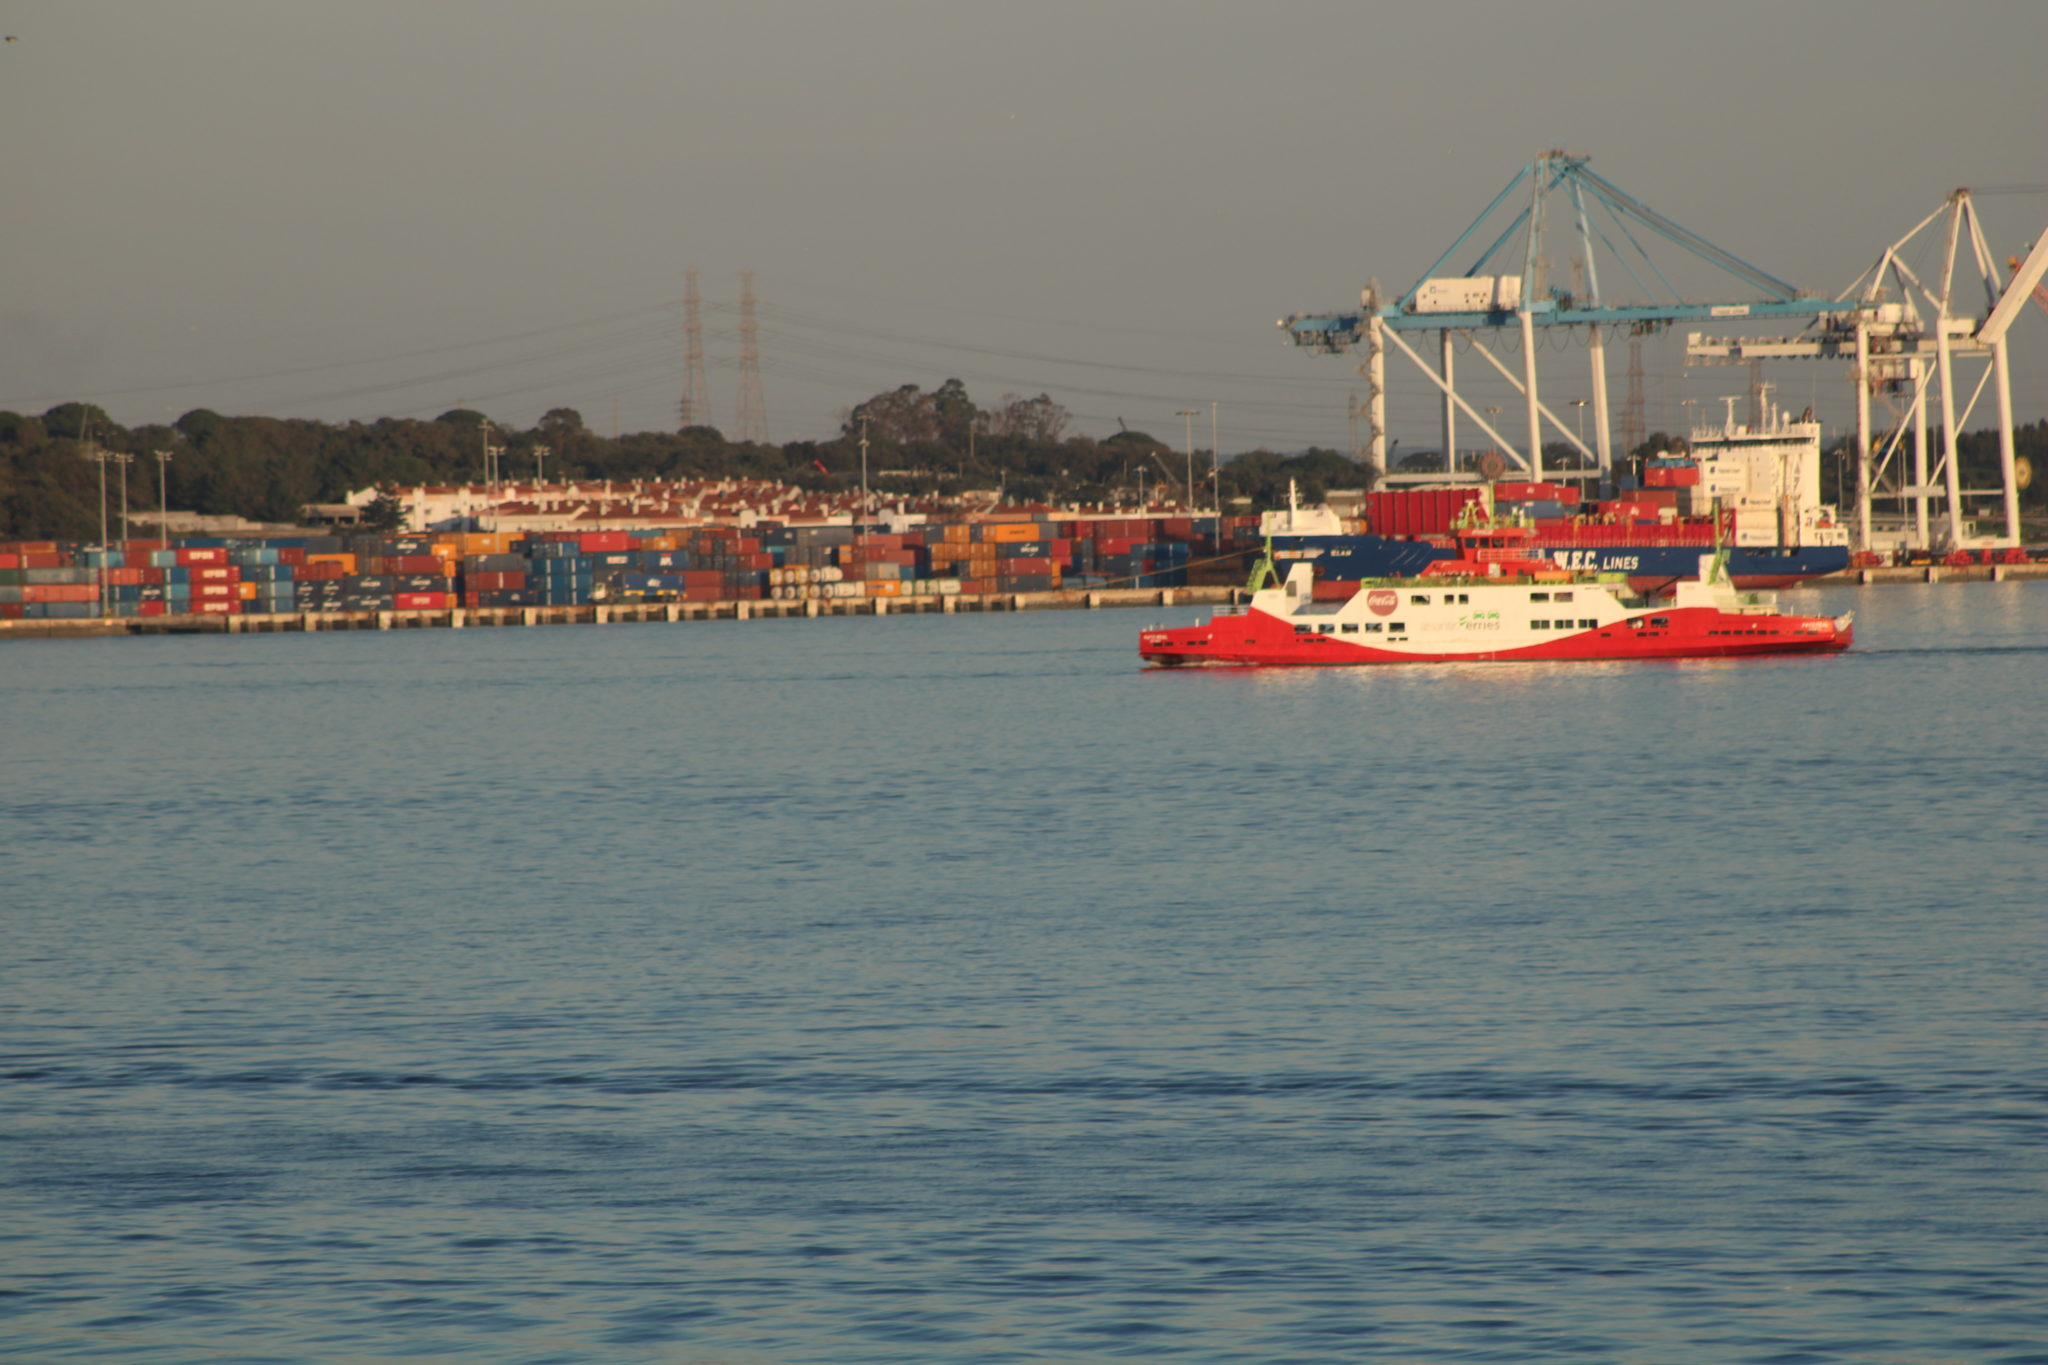 Contentores de carga do Porto de Setúbal